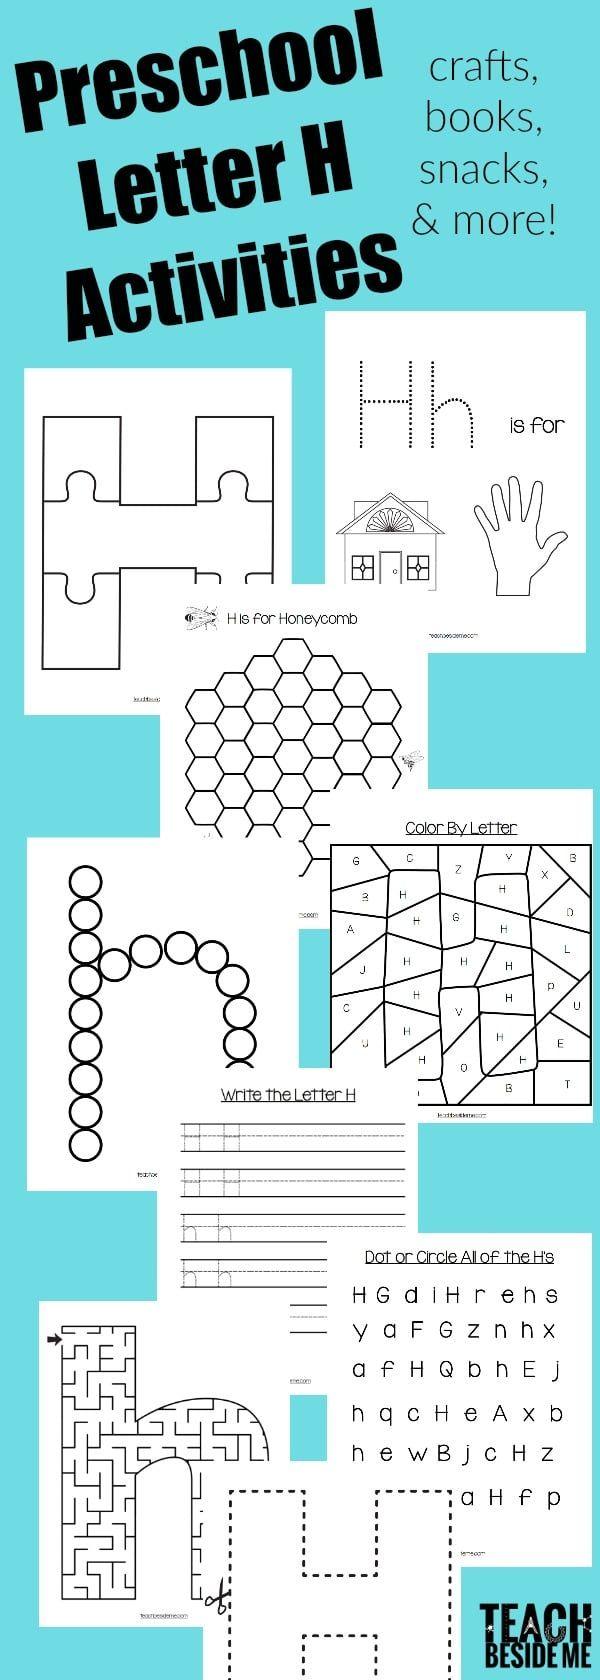 Workbooks letter h worksheets for kindergarten : Letter of the Week: Preschool Letter H Activities | Craft books ...